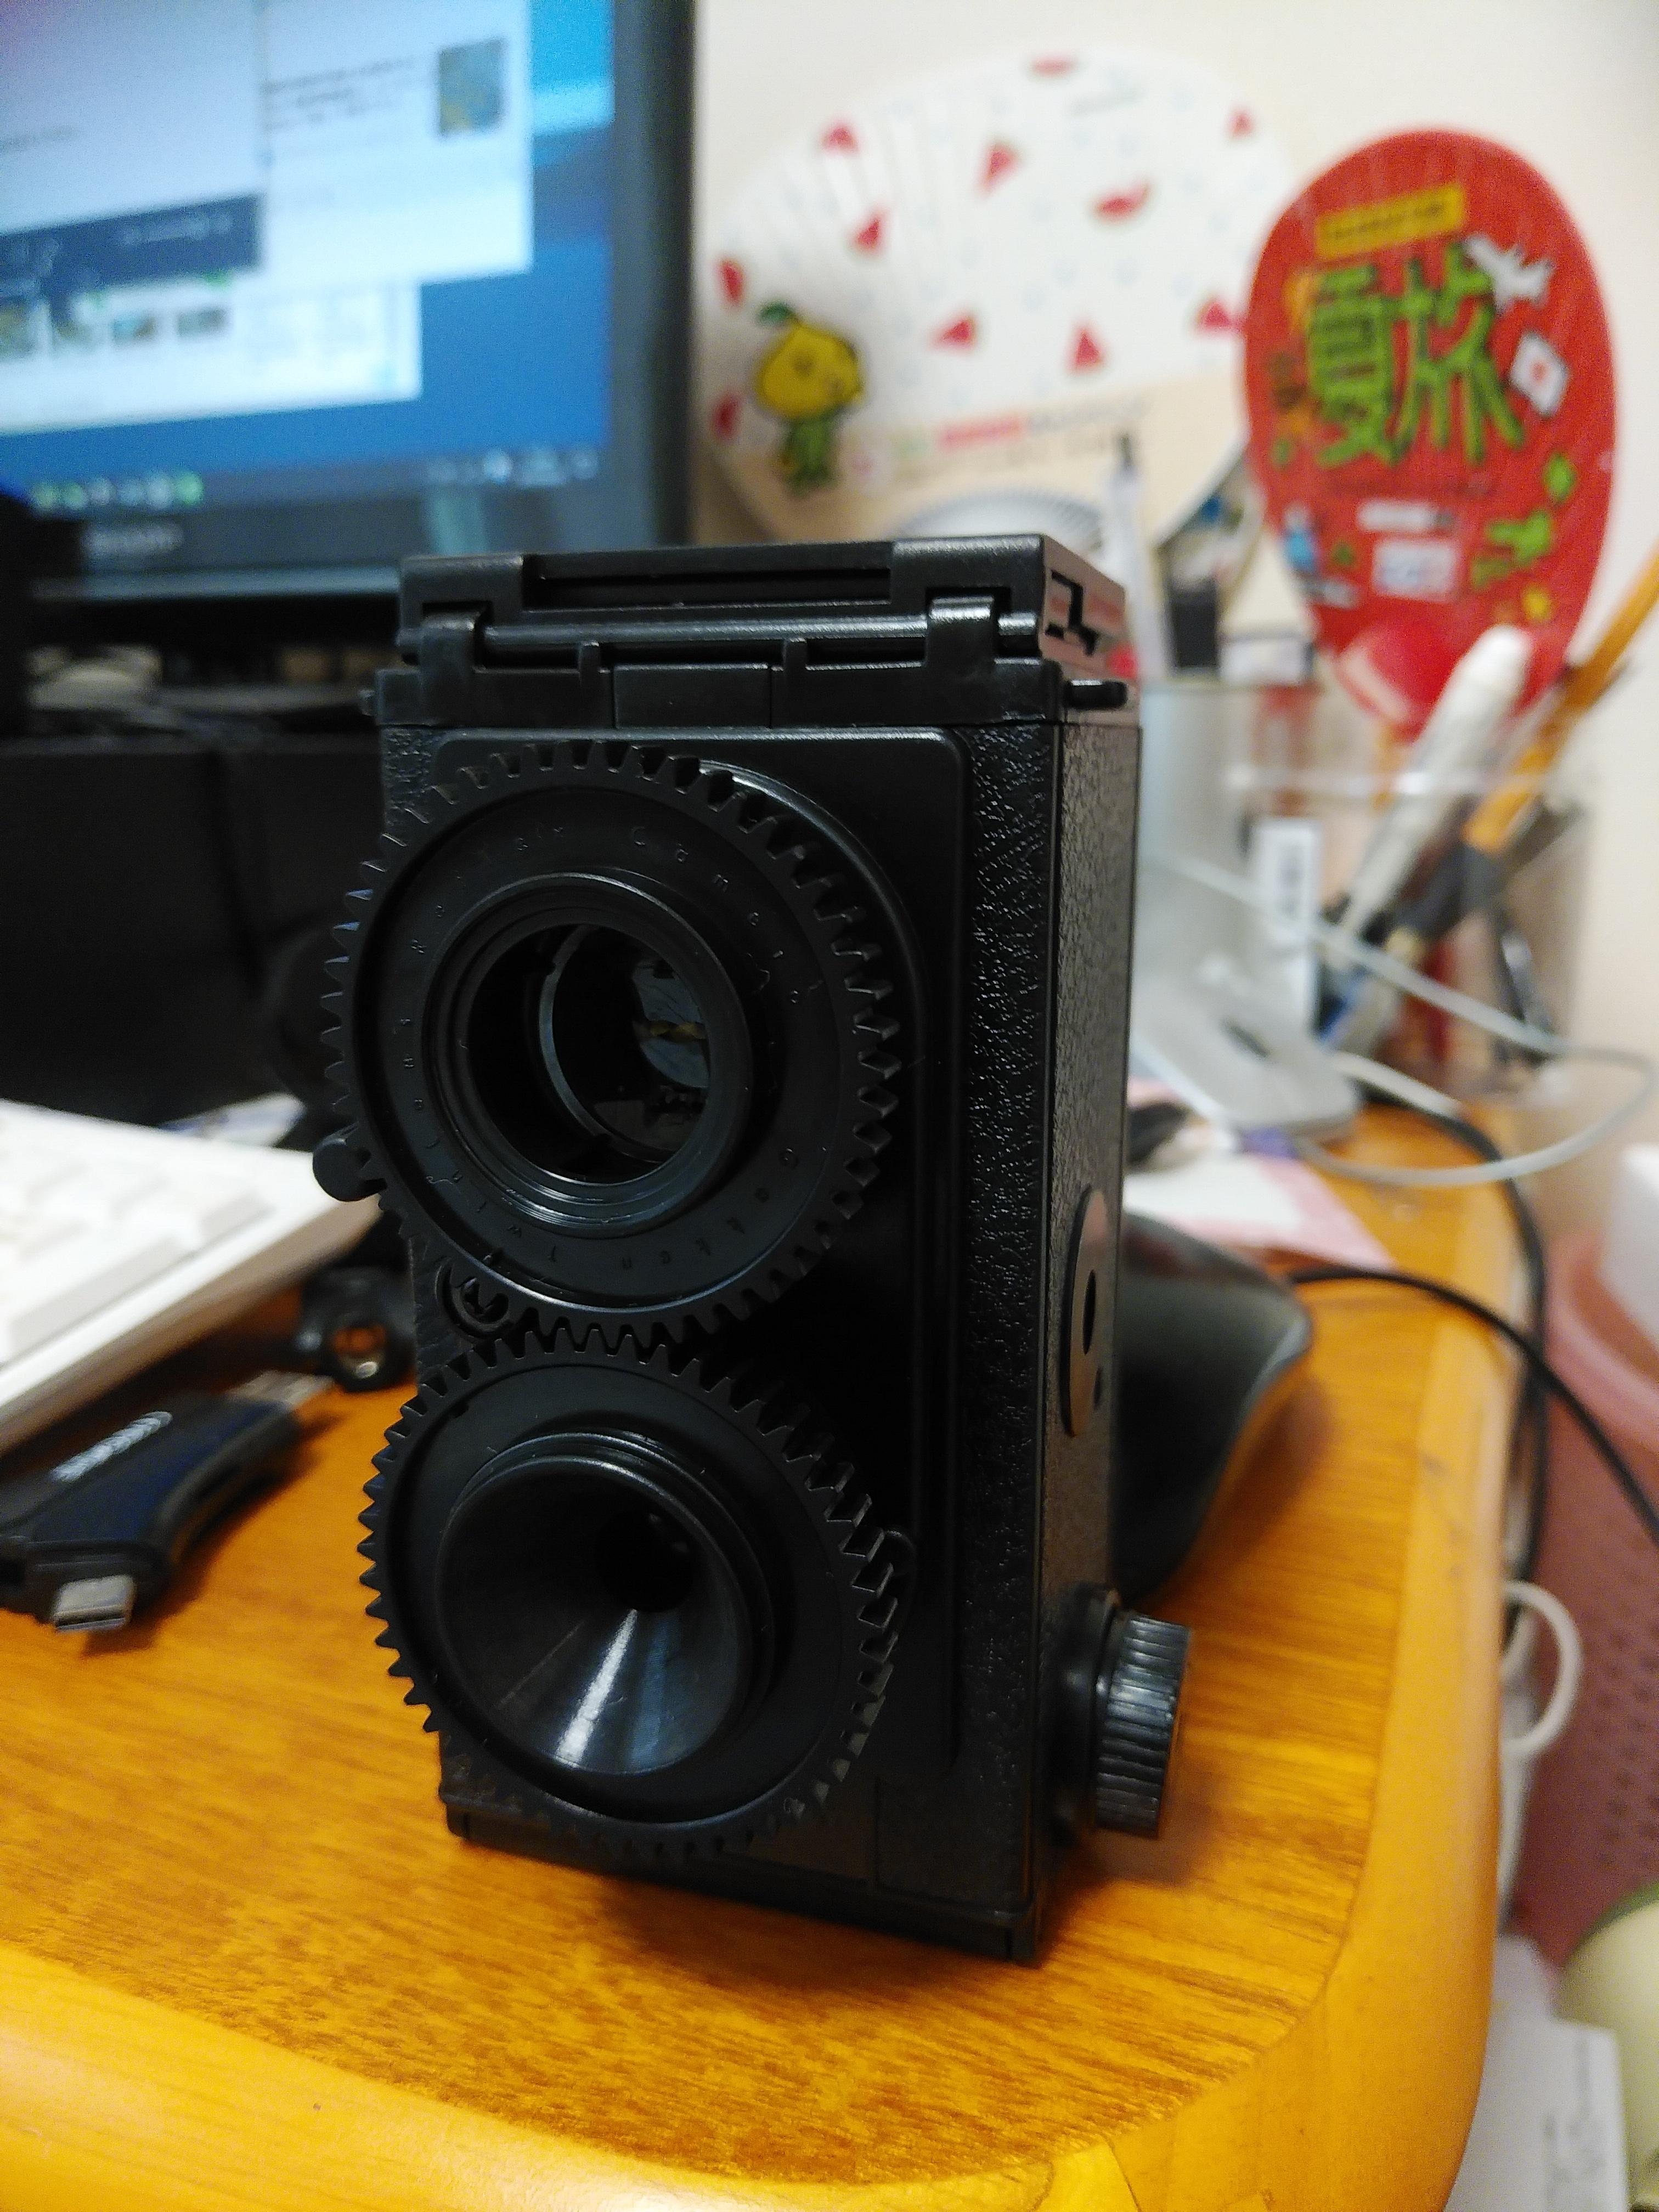 DSC_0106.jpg